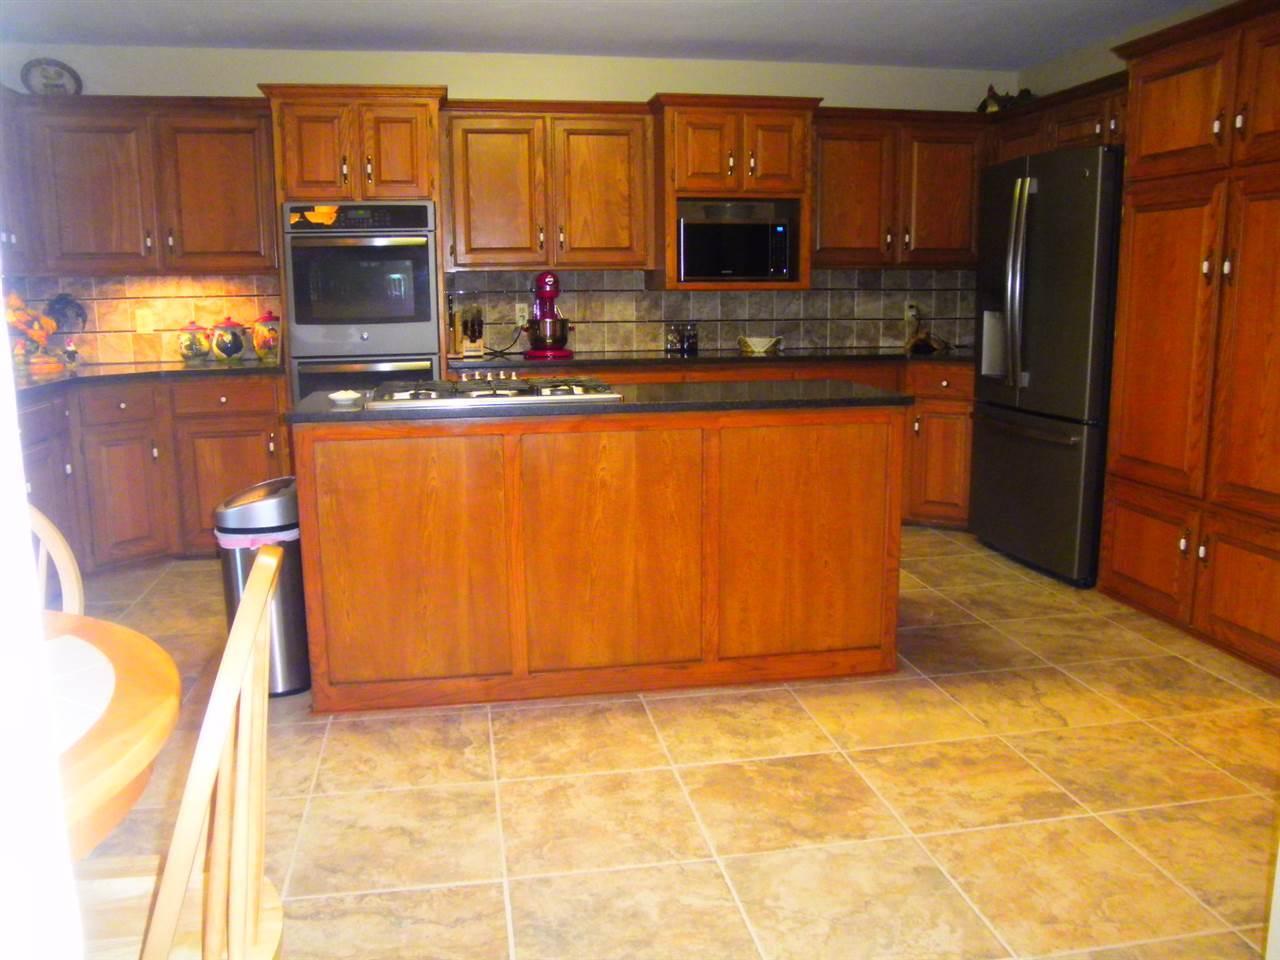 Sold Cross Sale W/ MLS | 32 Raintree Ponca City, OK 74604 6